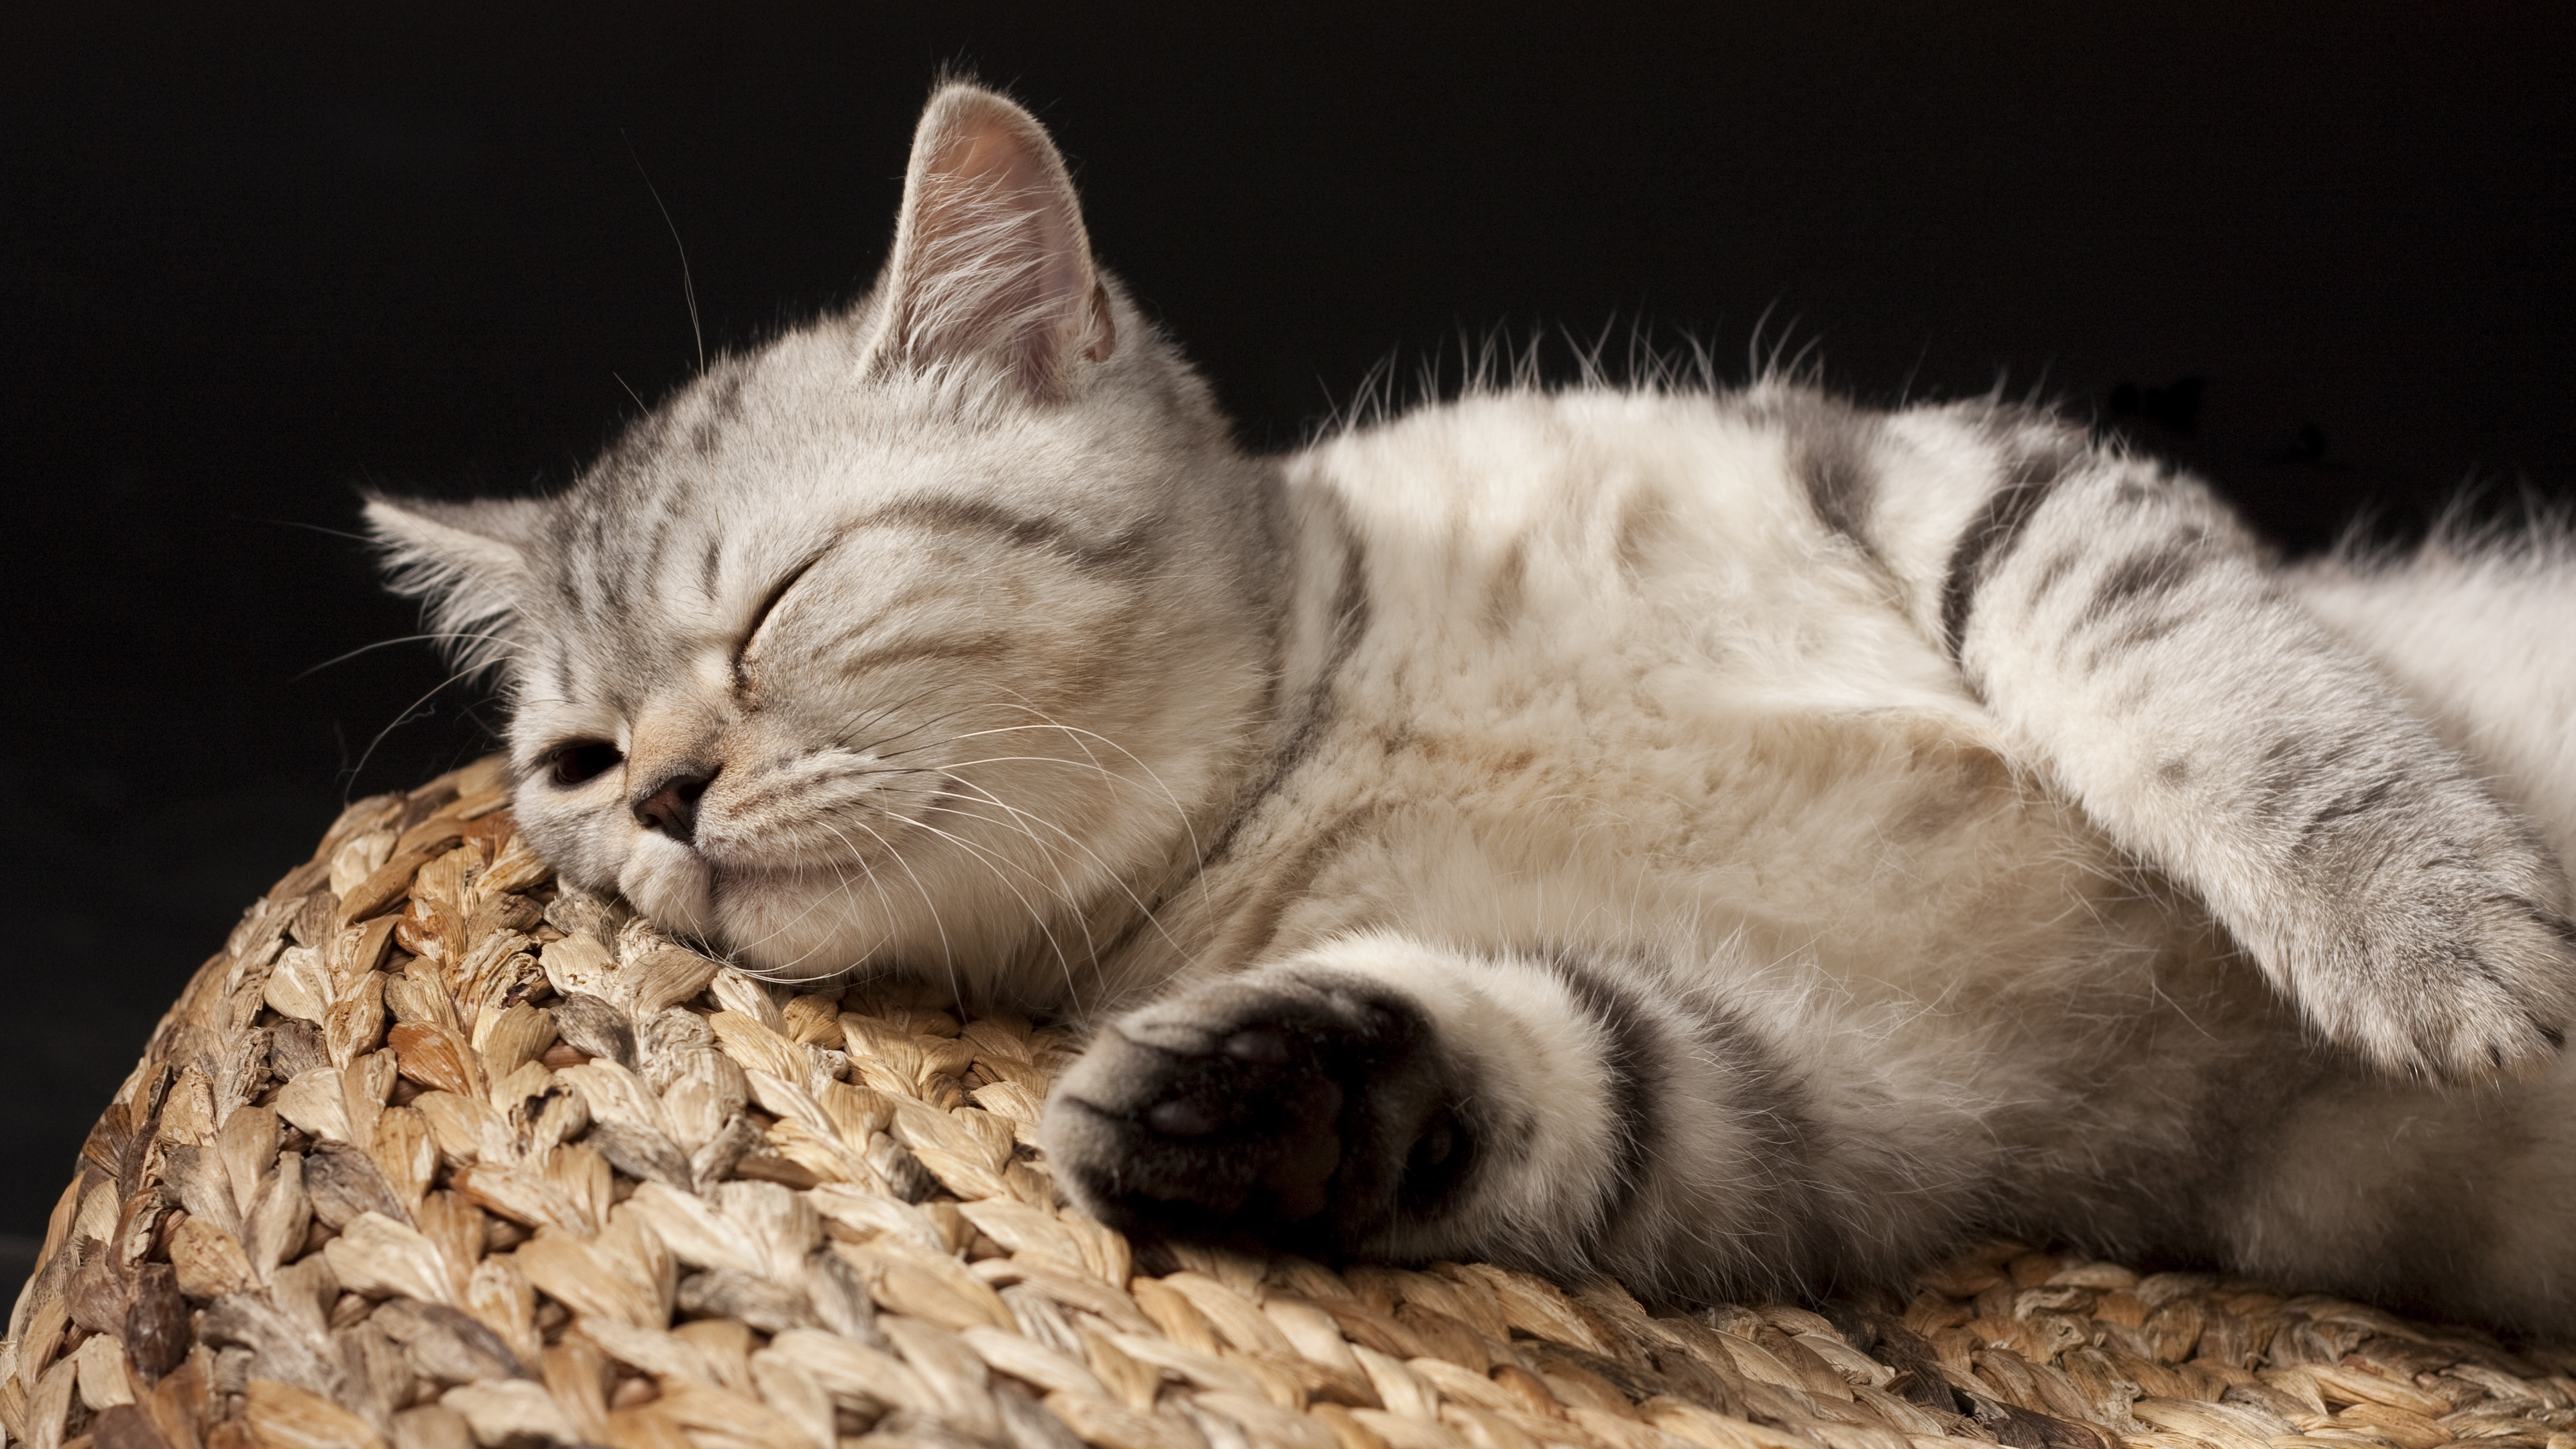 kitten sleeping striped lie 4k 1542242632 - kitten, sleeping, striped, lie 4k - striped, Sleeping, Kitten